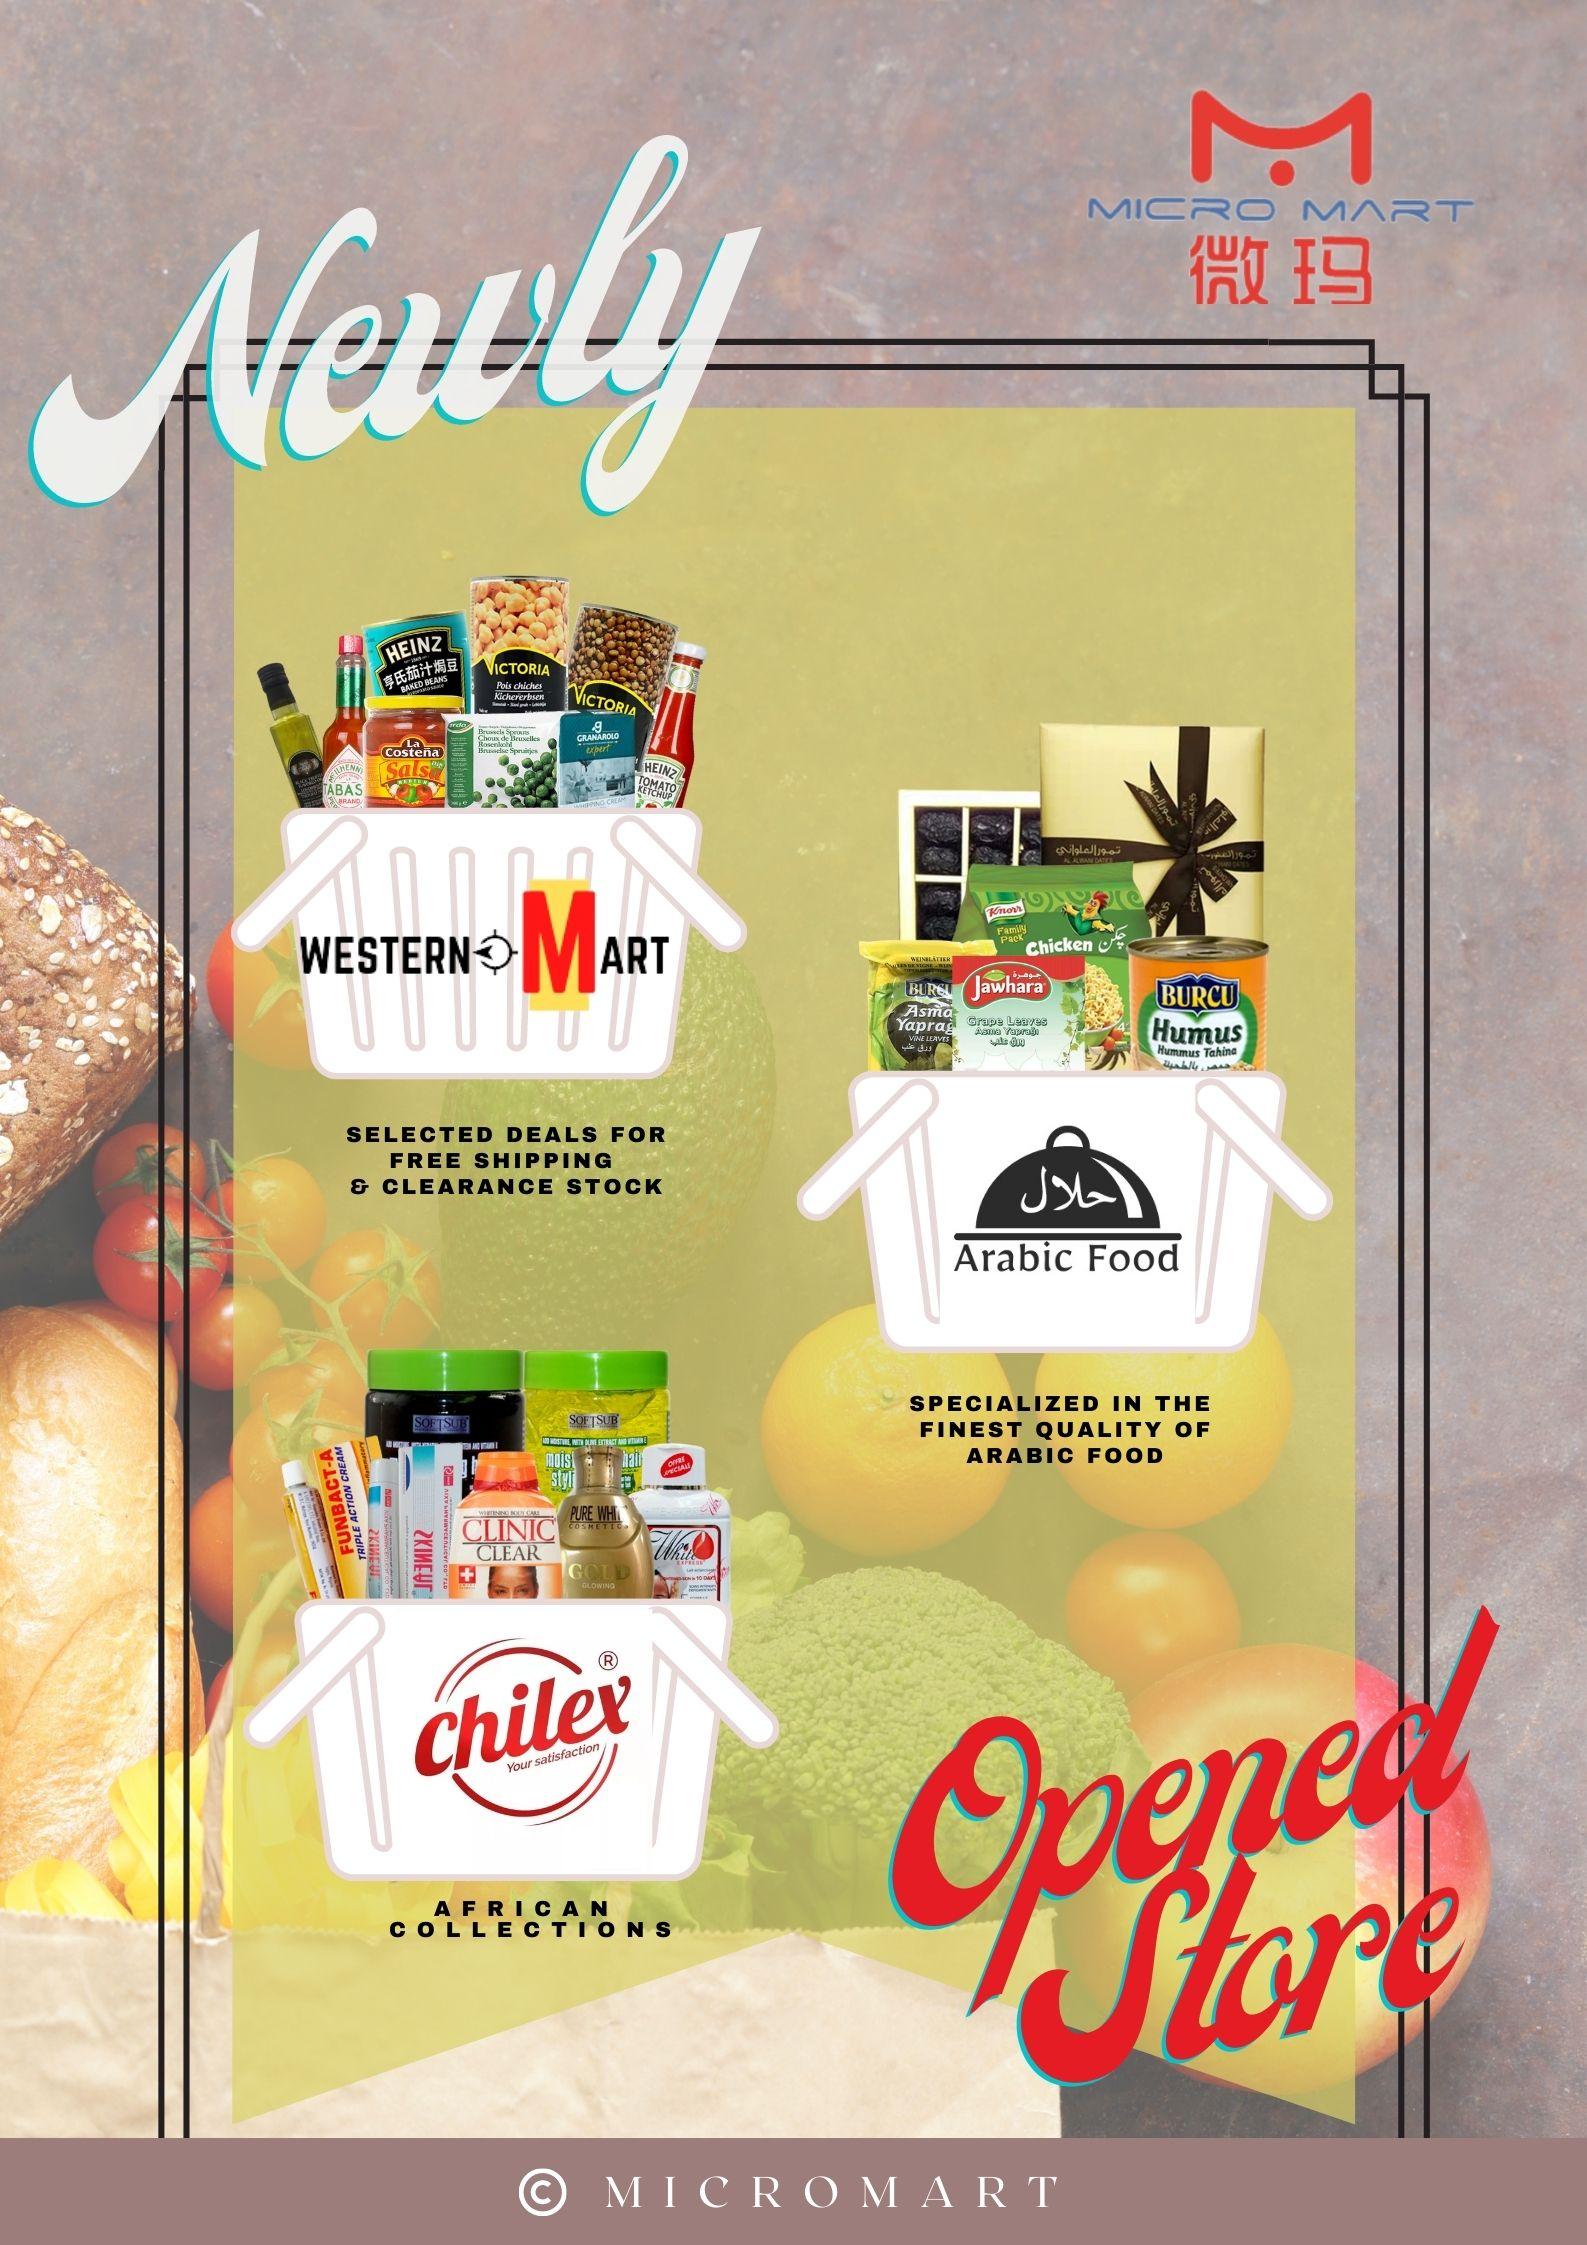 Micromart Article New Store (2).jpg